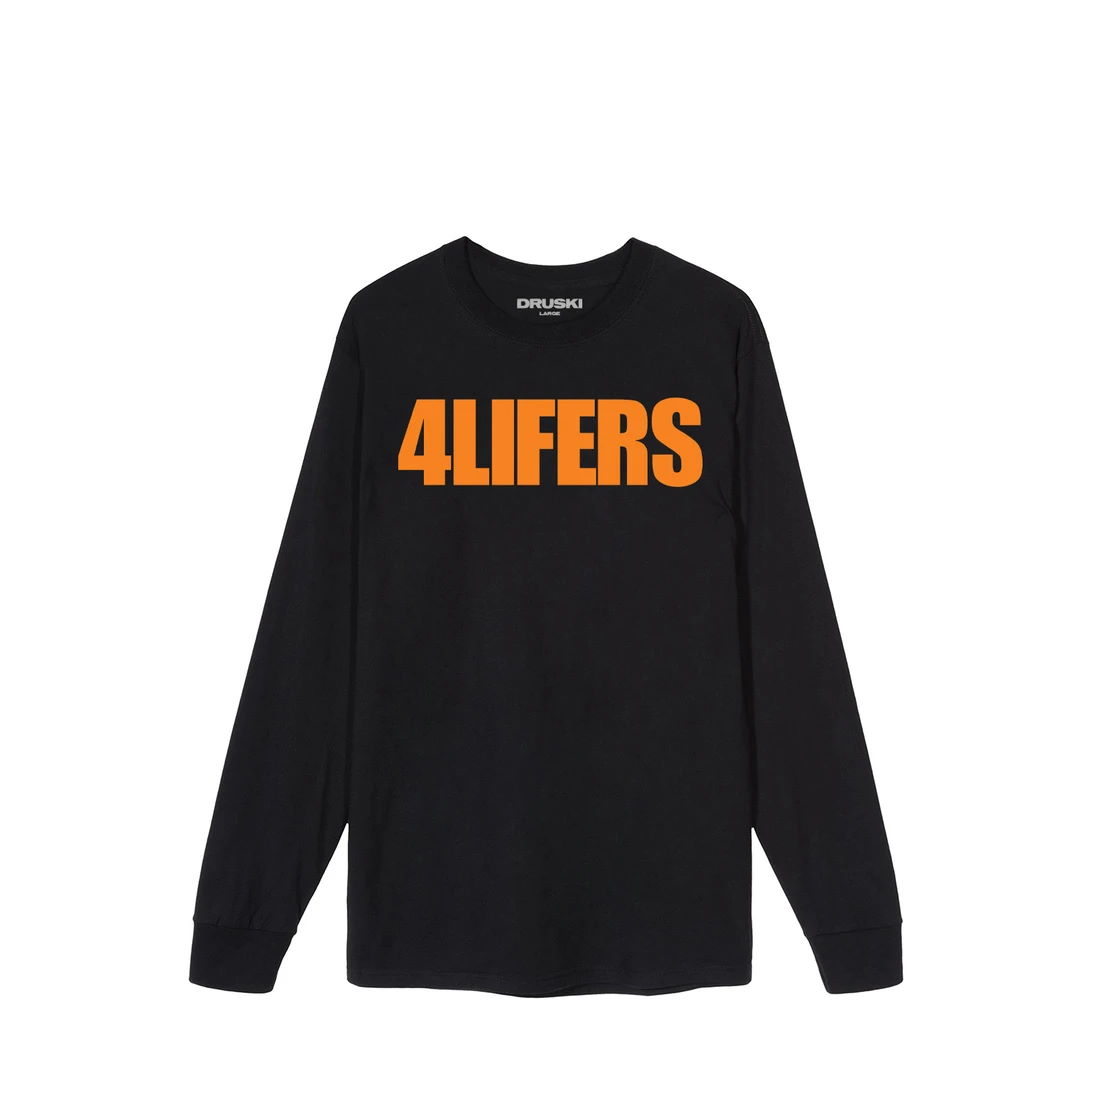 4Lifers Long Sleeve Tee - Black